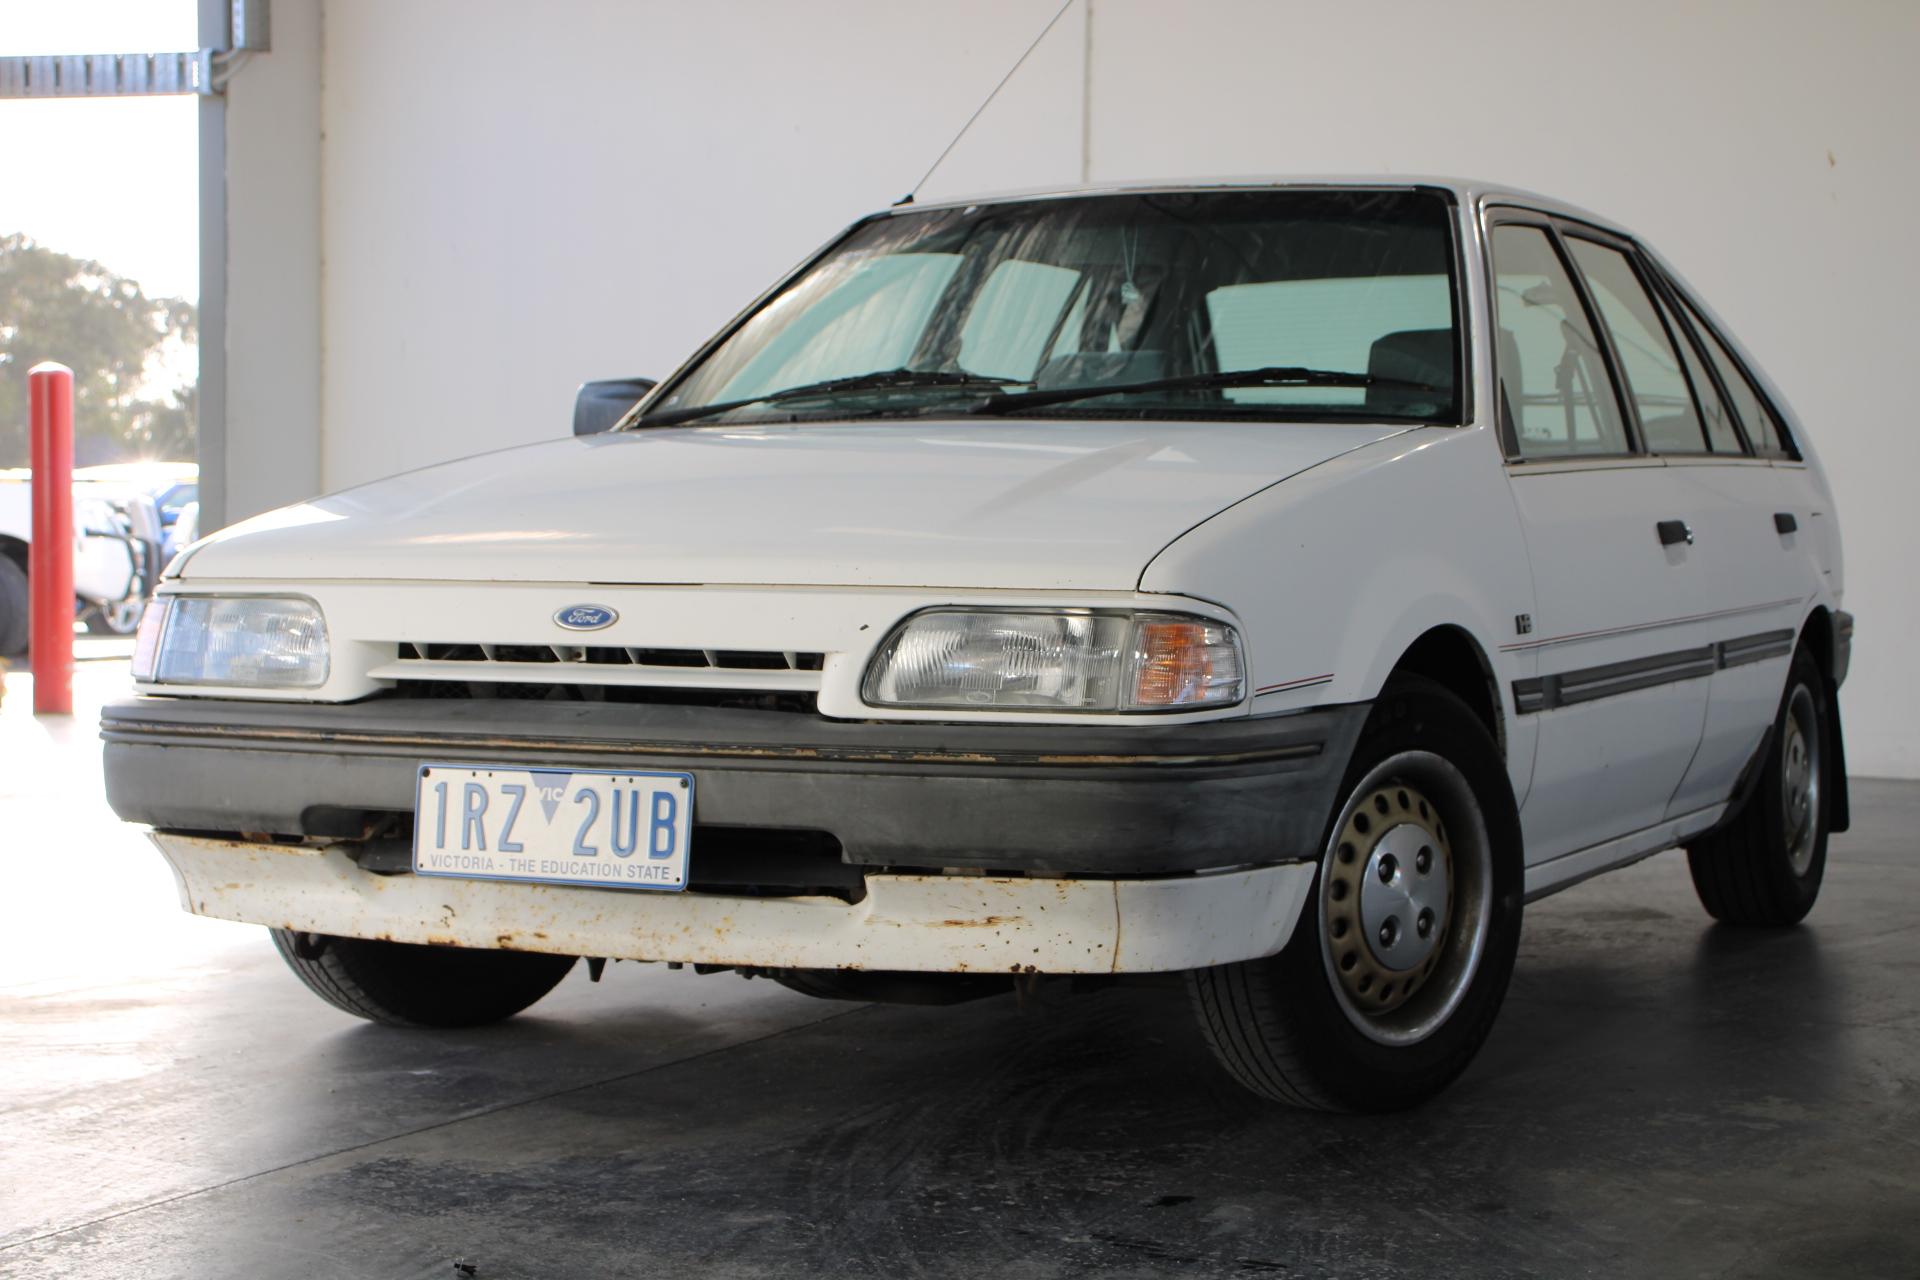 1989 Ford Laser Automatic Hatchback